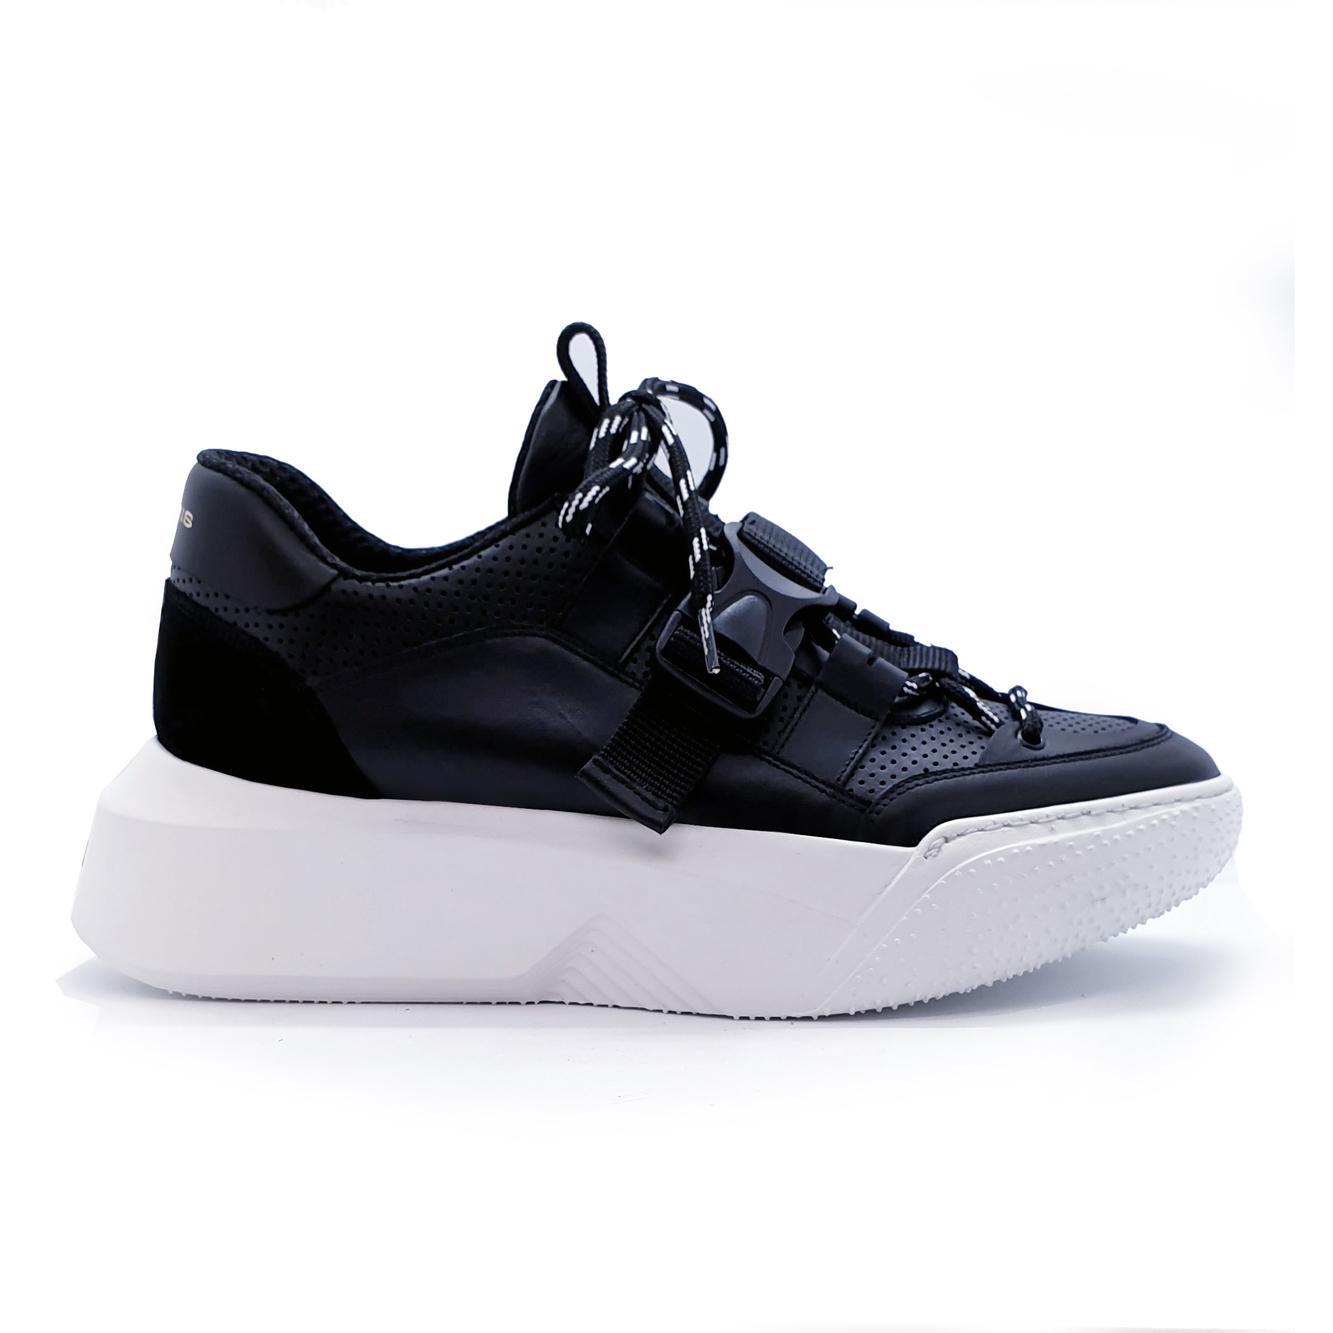 X13 BLACK